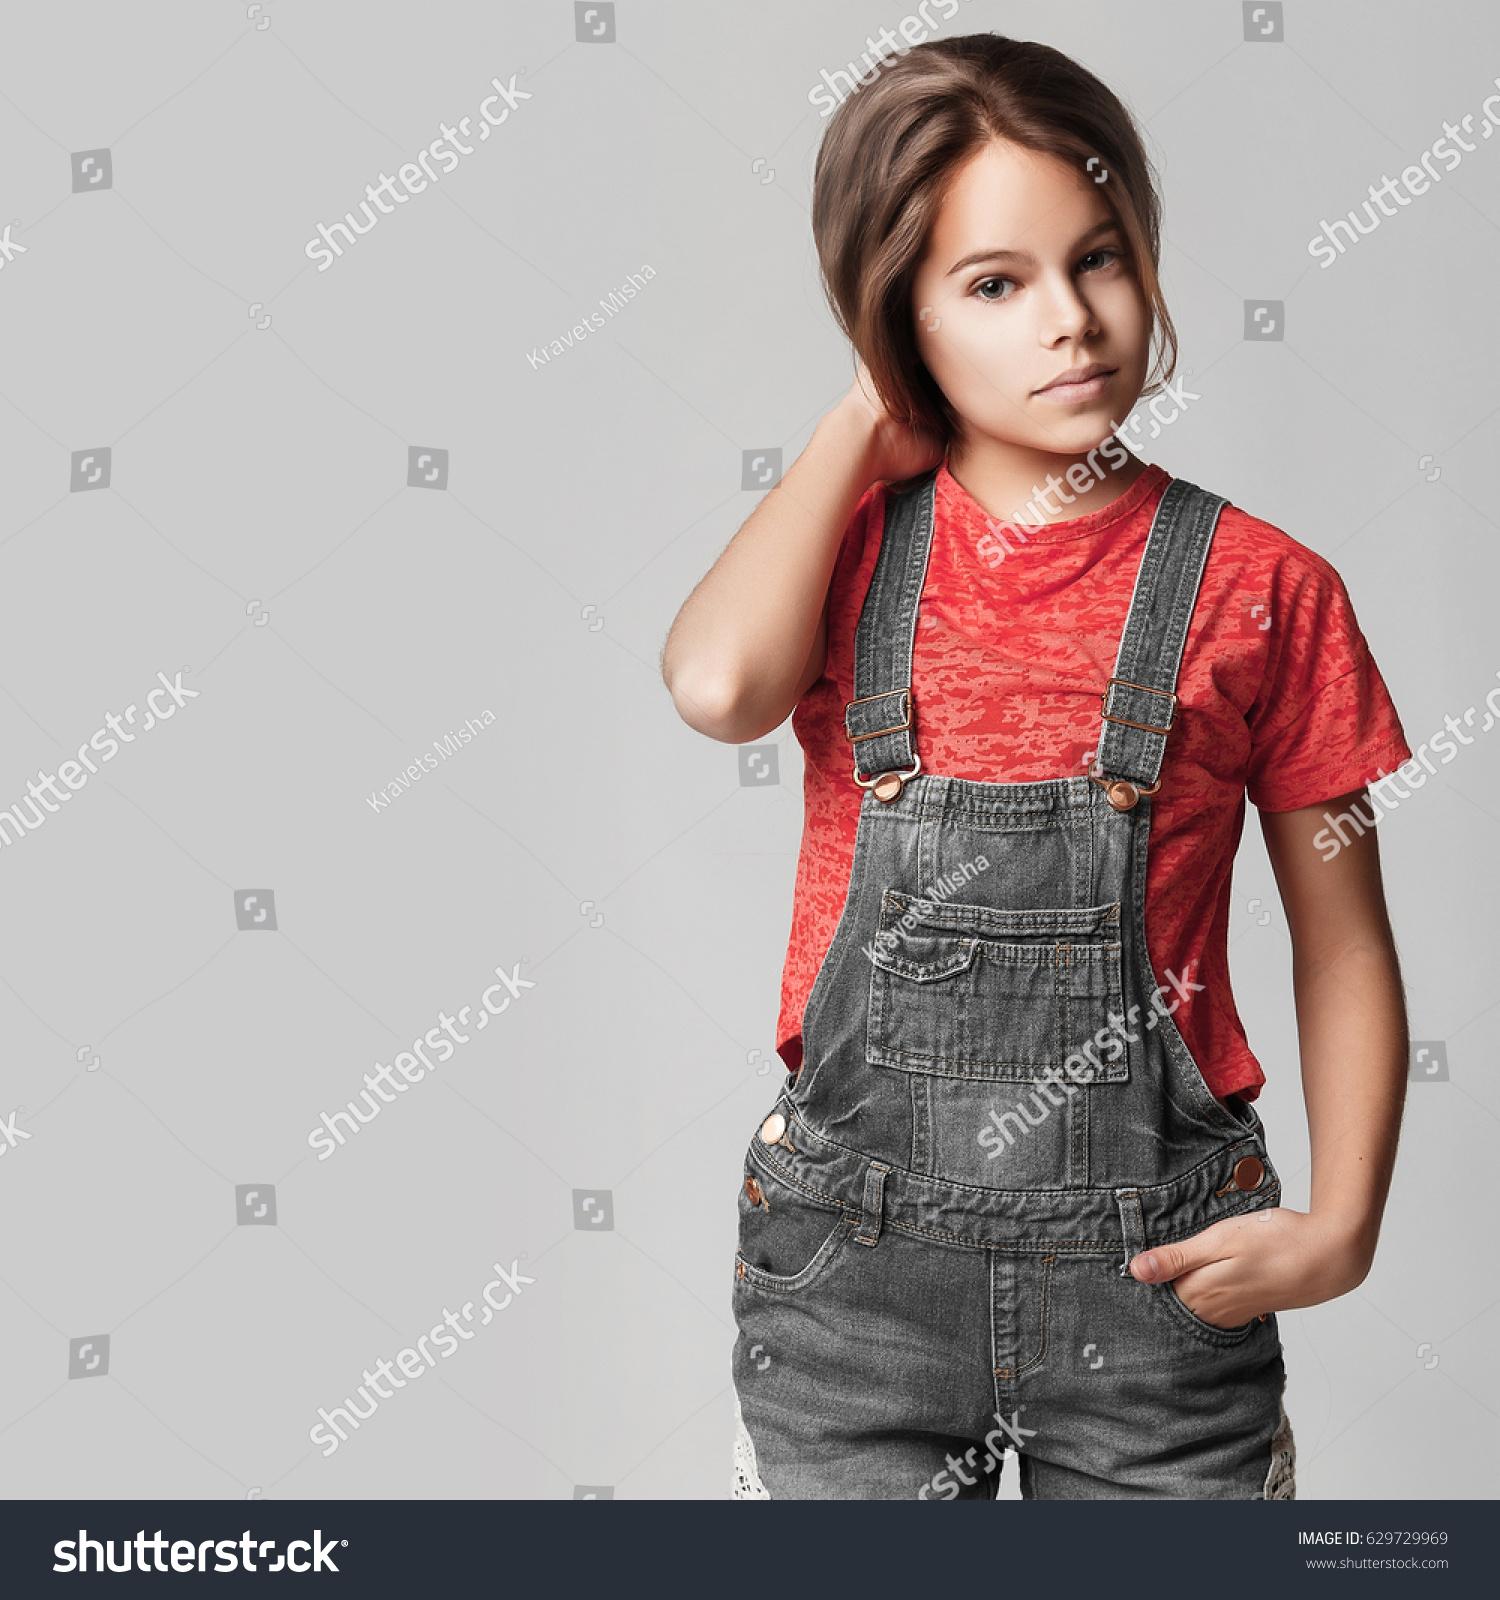 Cute teen girl jeans congratulate, brilliant